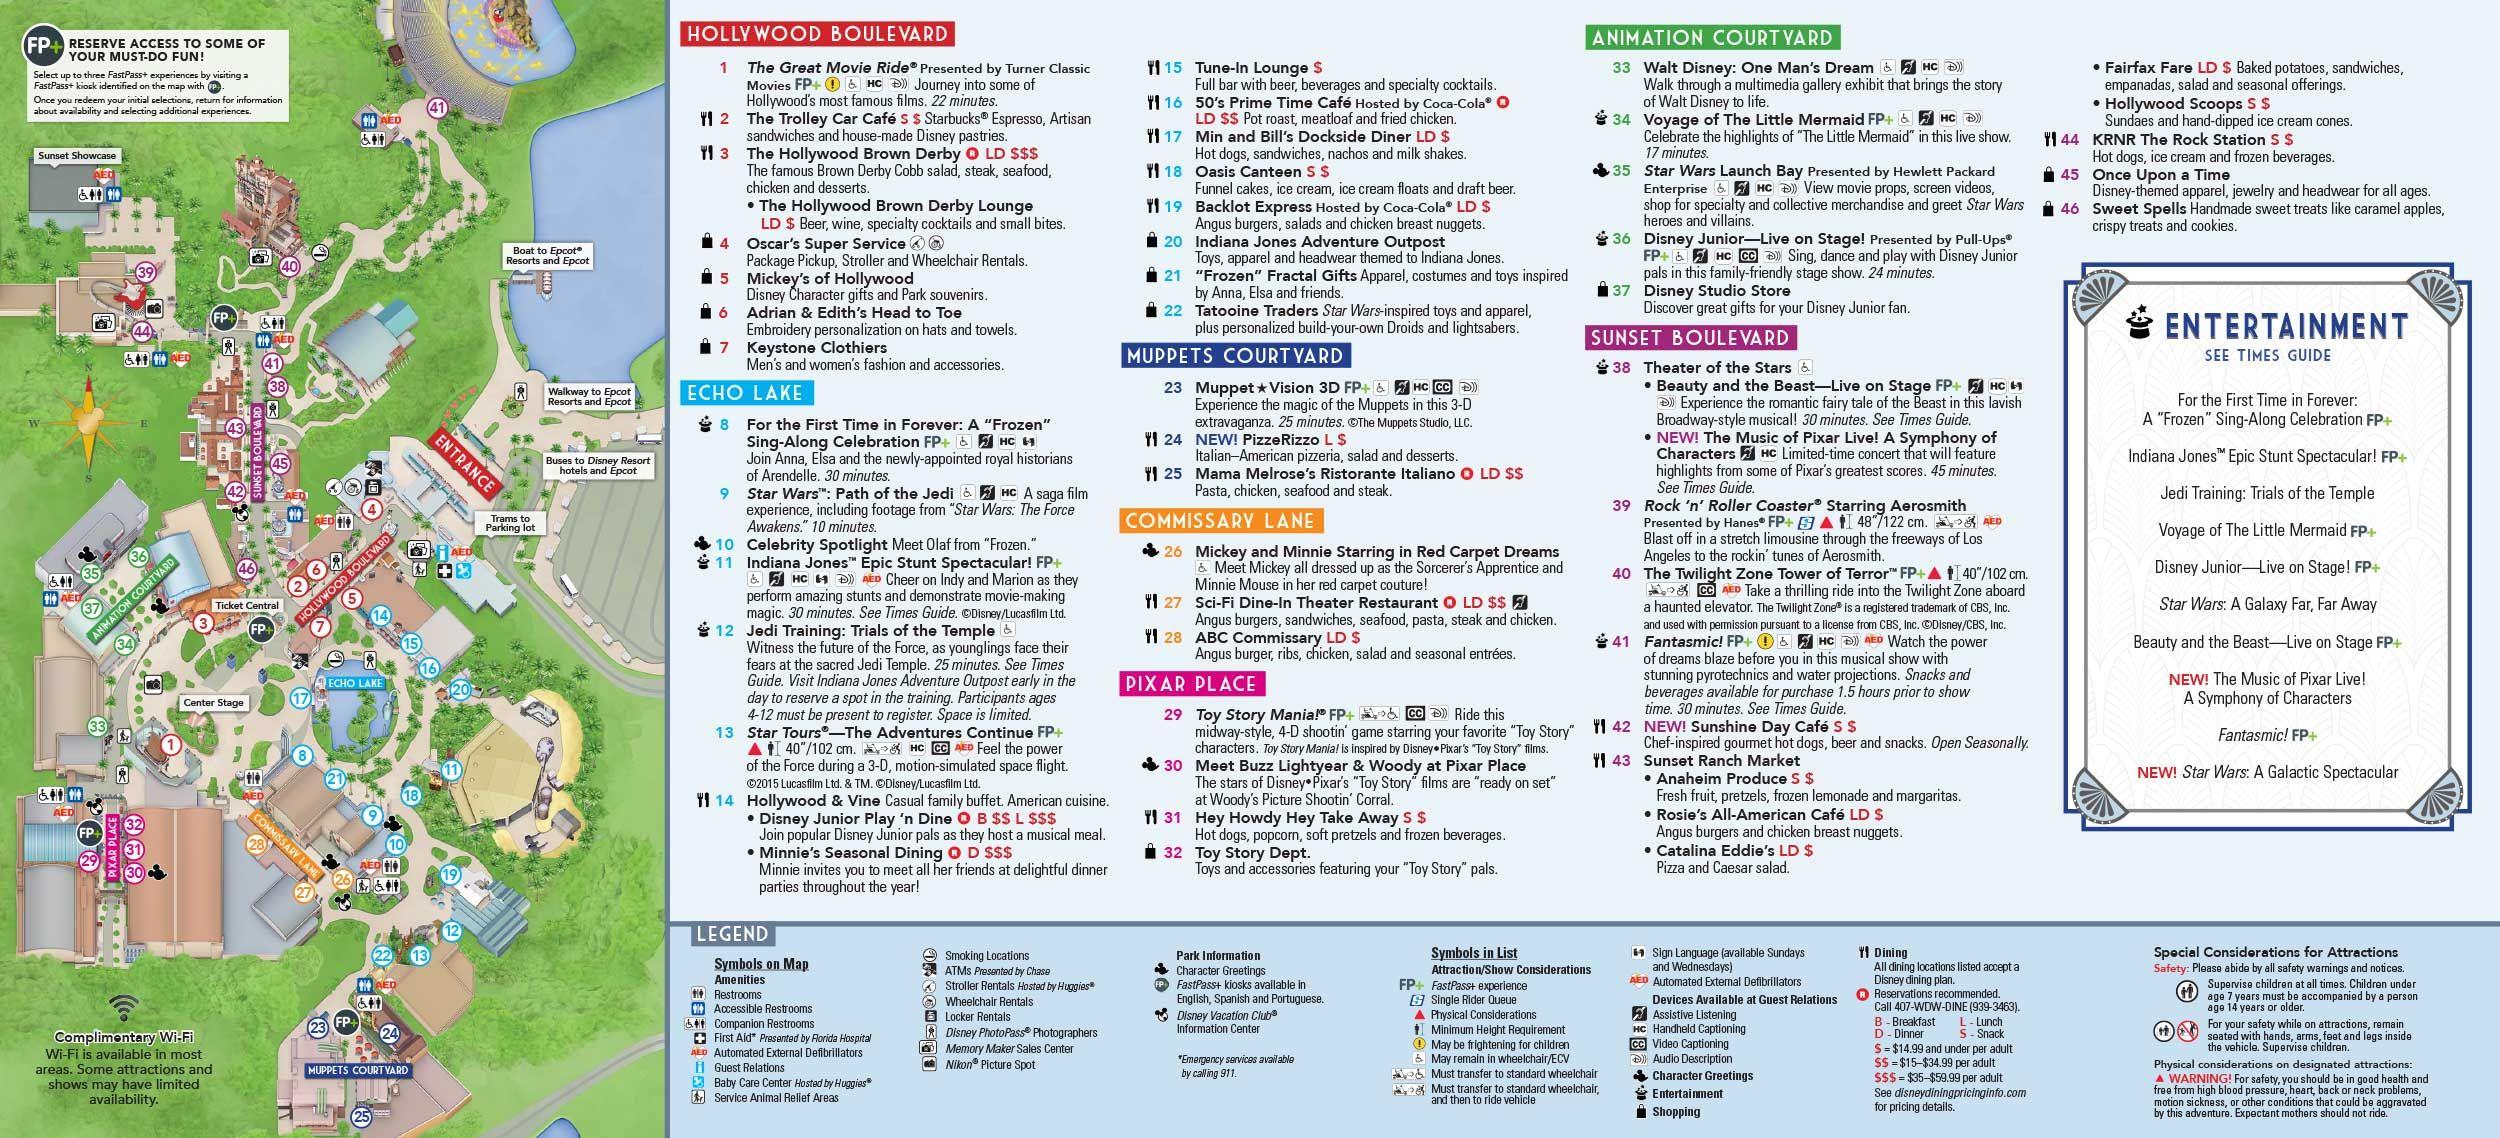 Disney Hollywood Studios map | disney | Hollywood studios, Hollywood ...